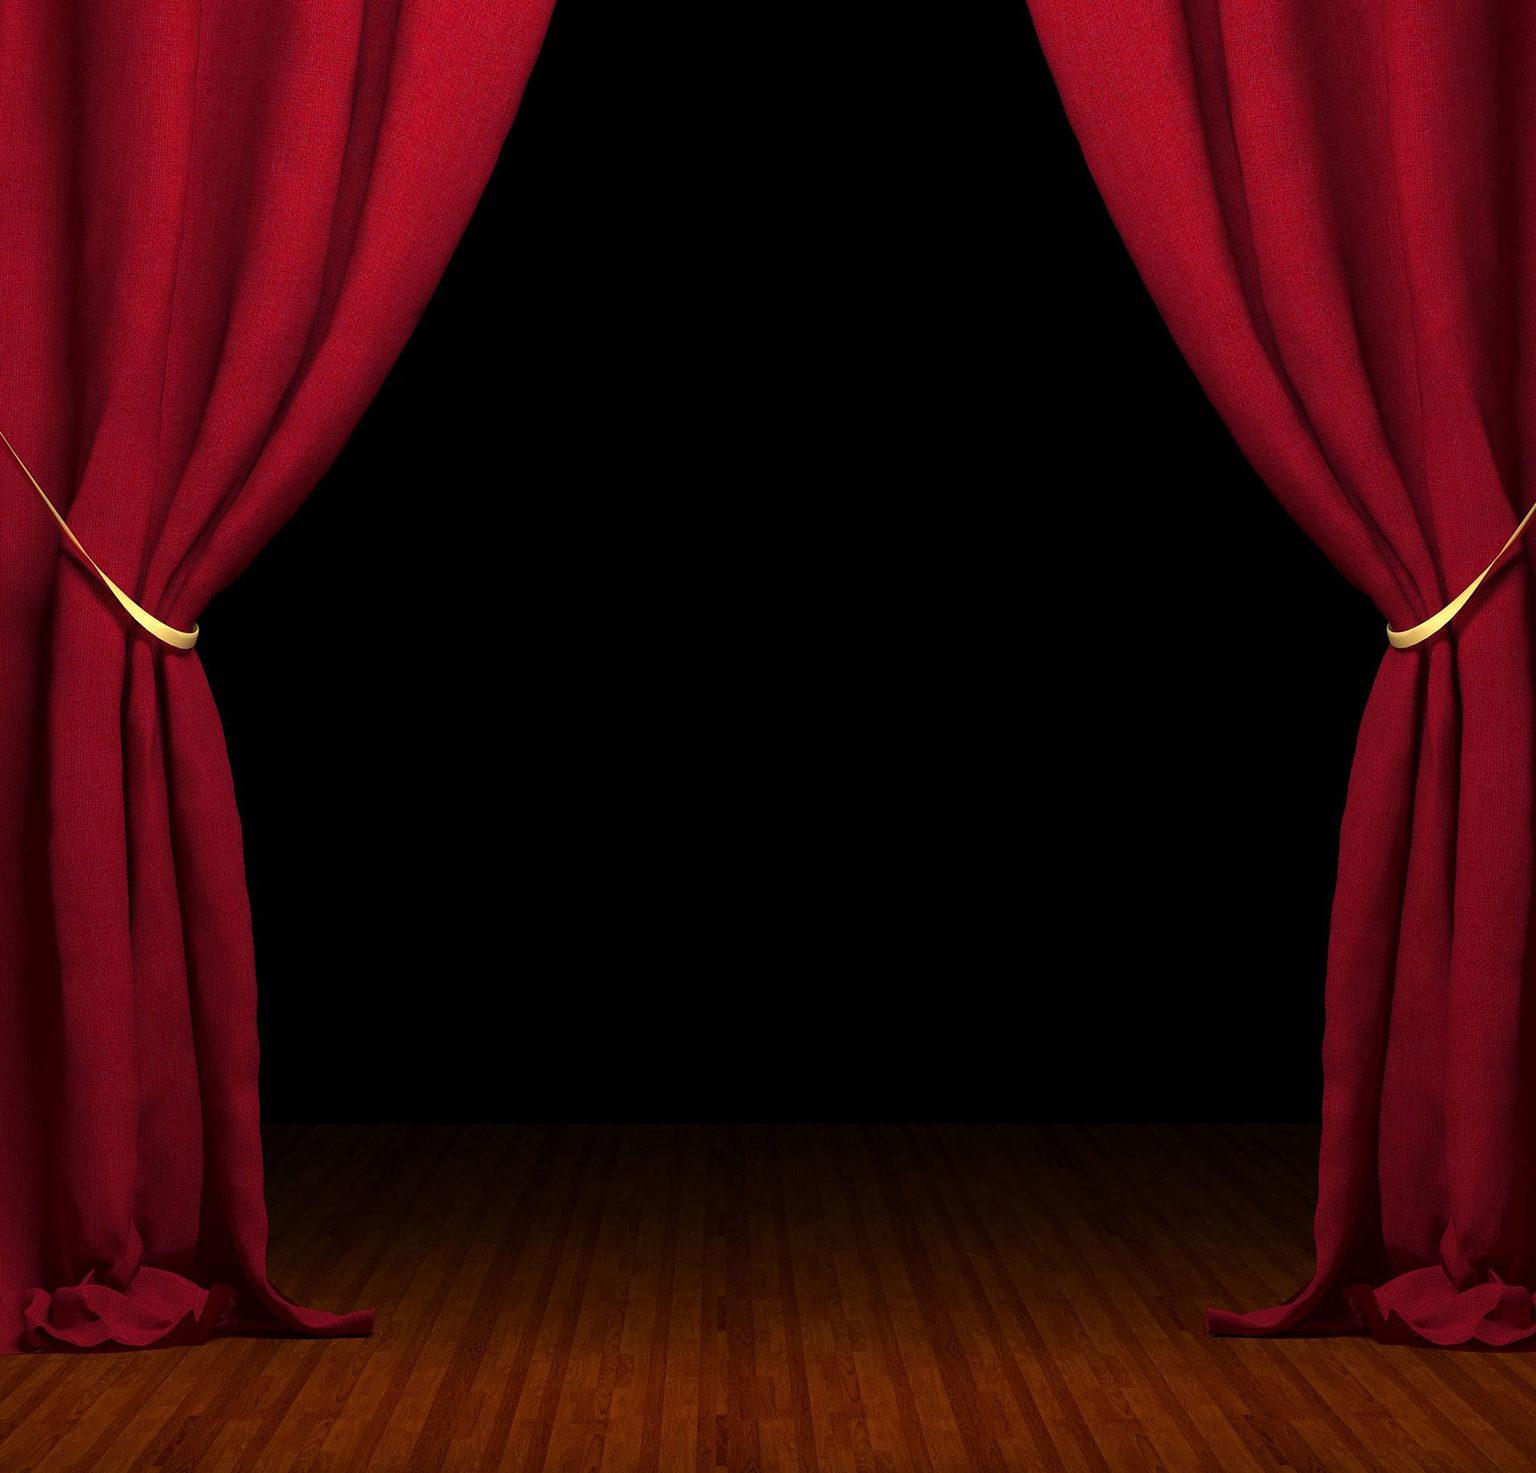 red_theater_curtain-e1500490921306.jpg